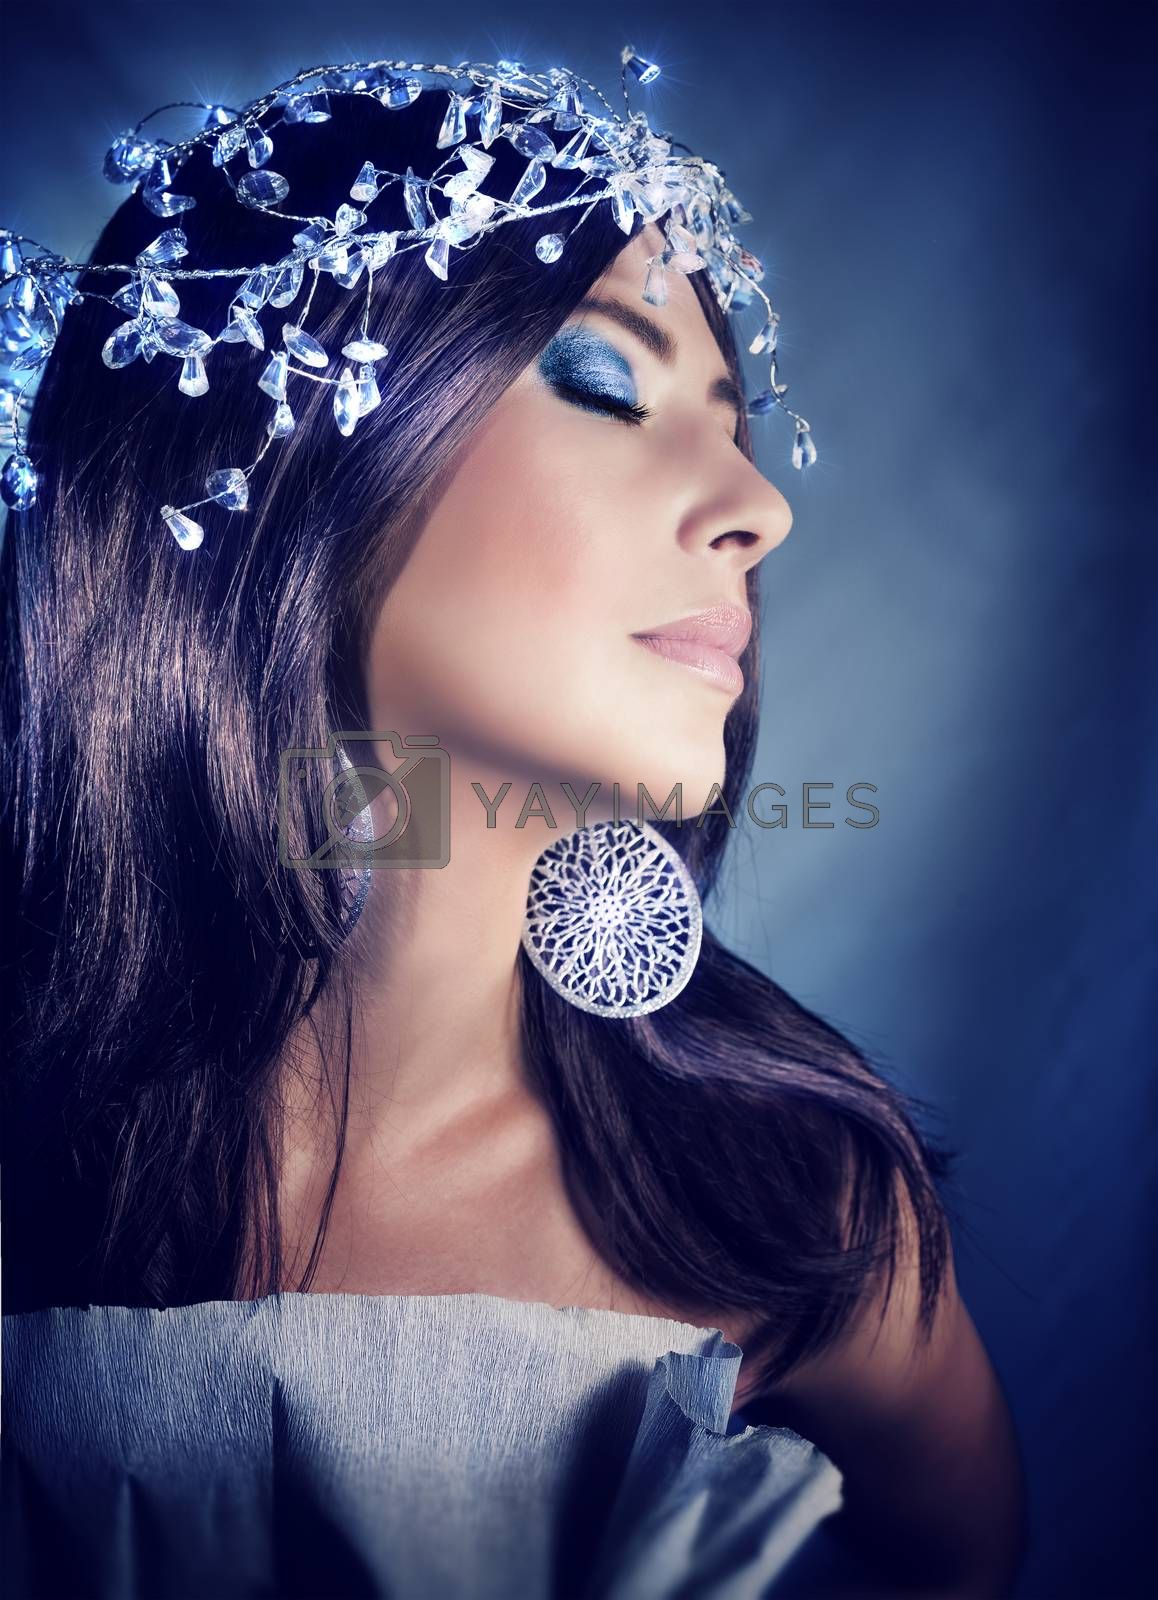 Fashion model portrait by Anna_Omelchenko